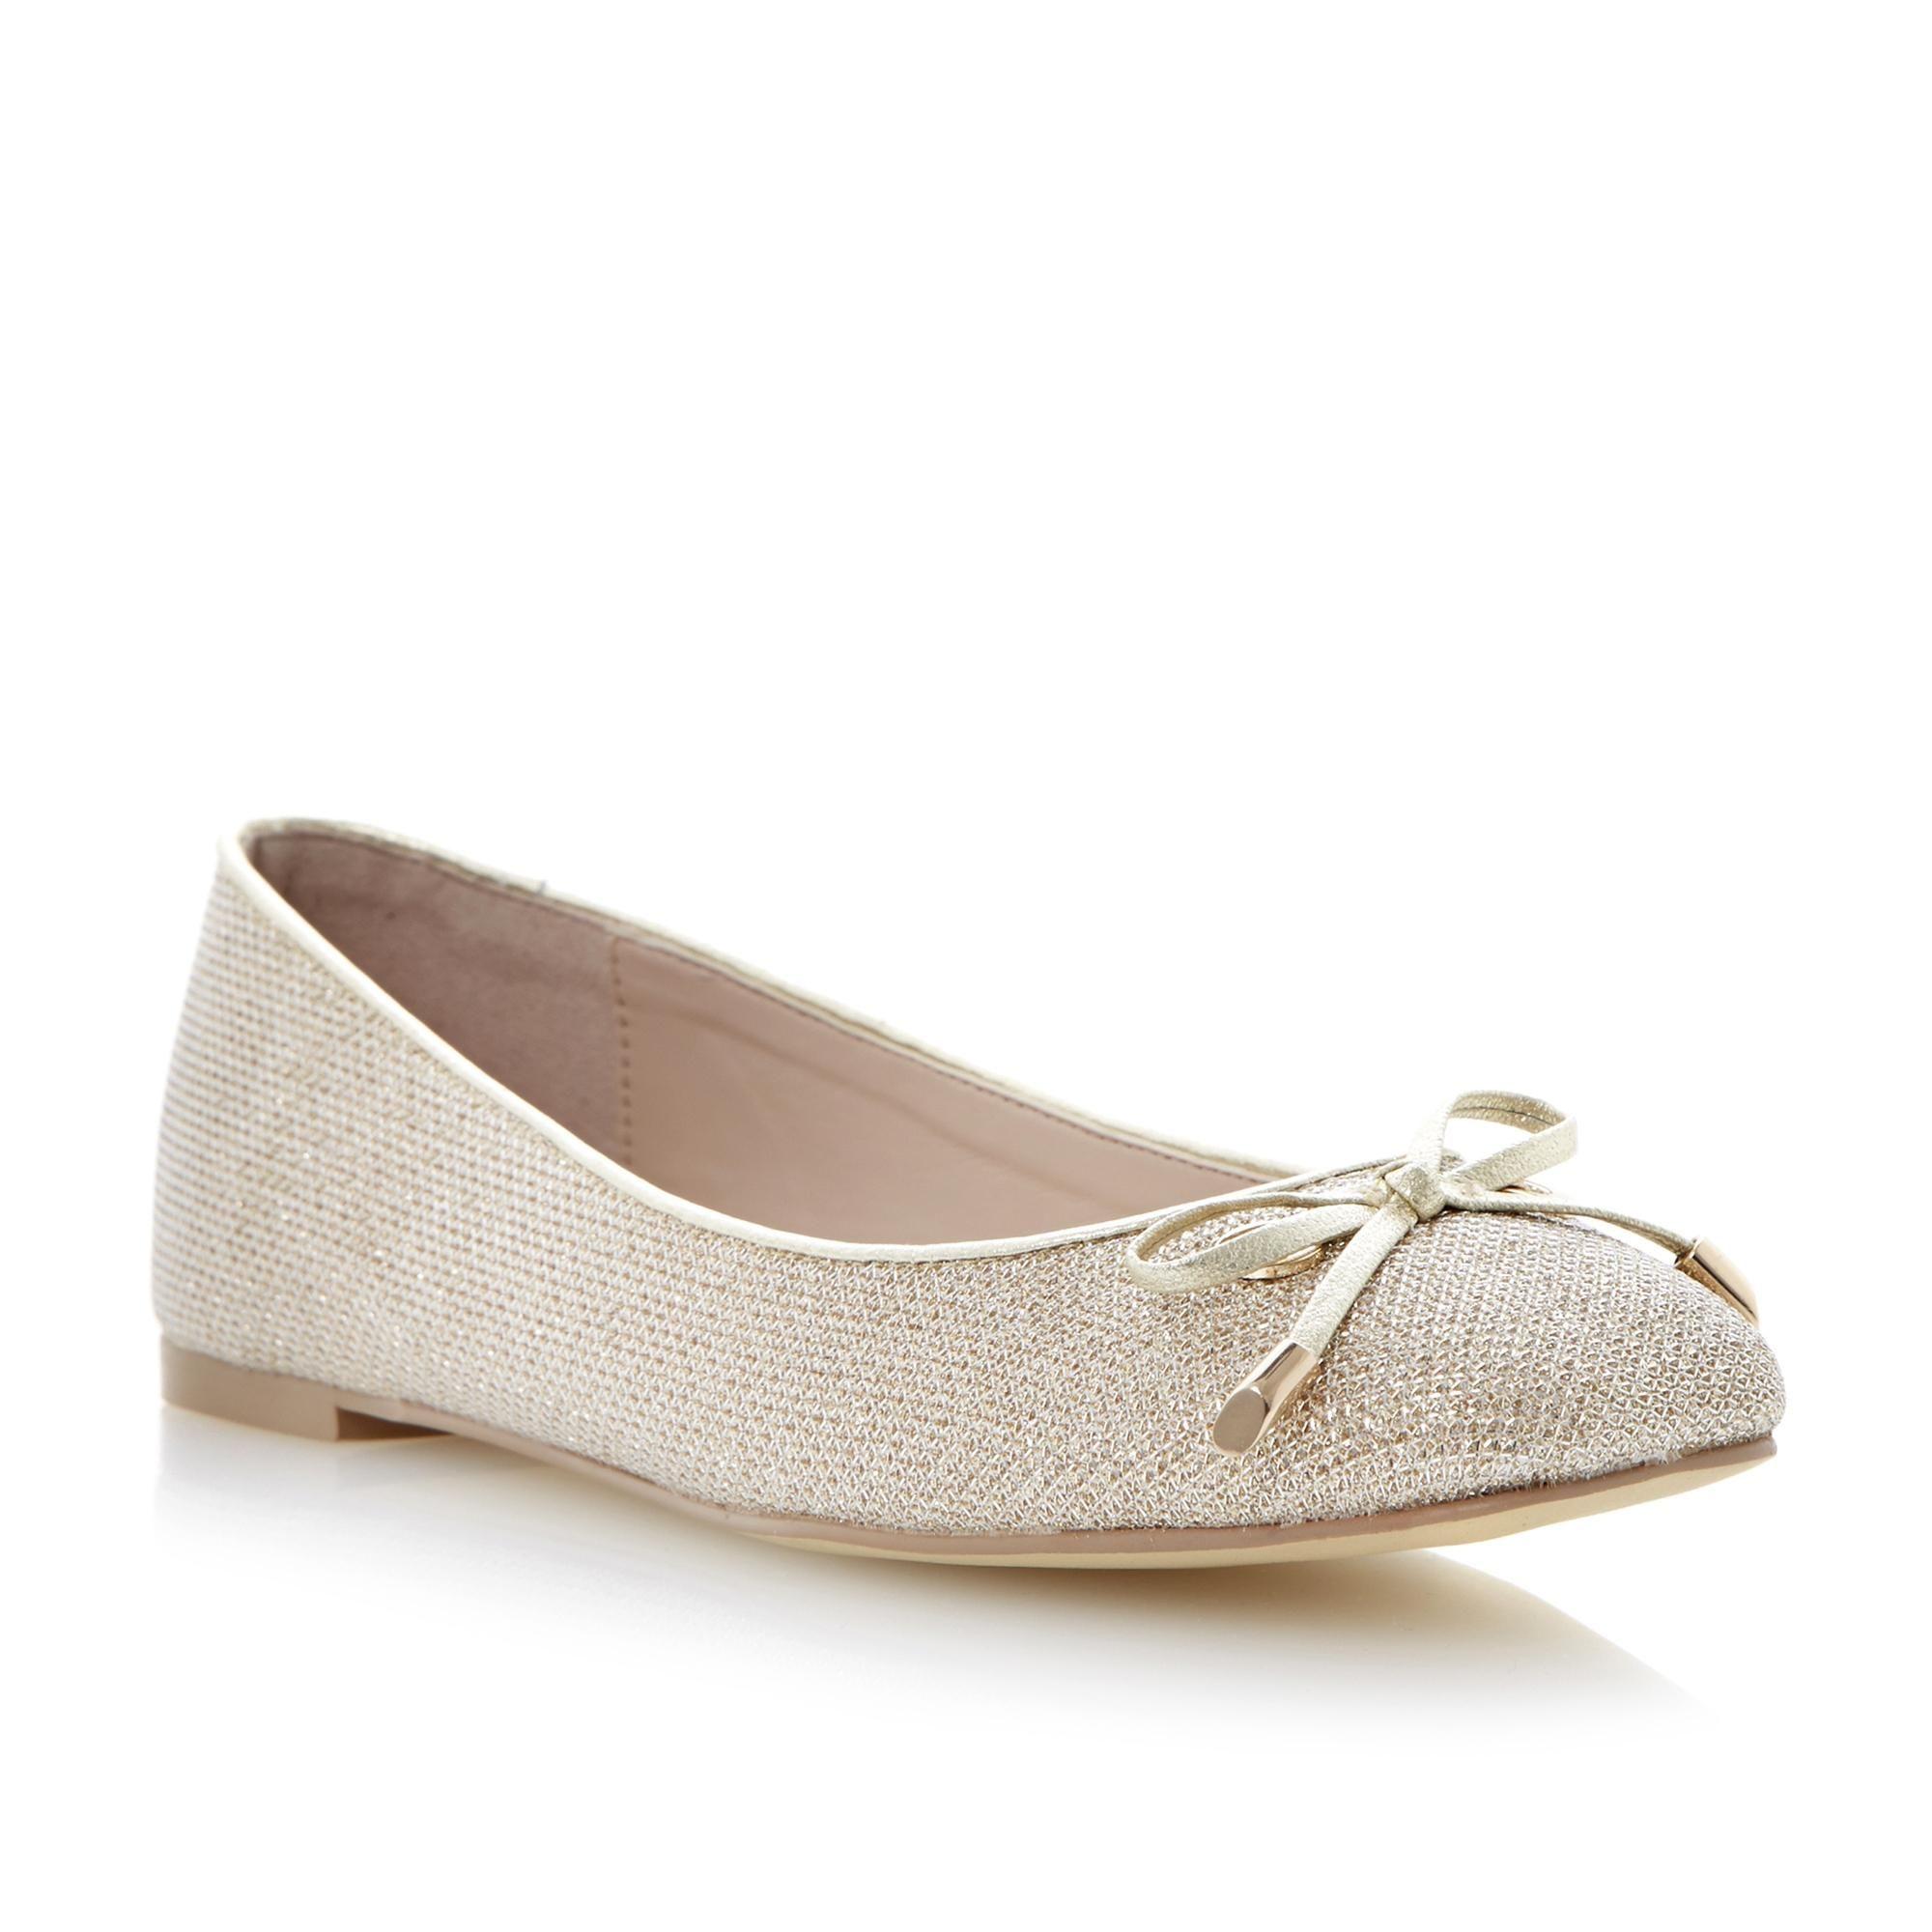 Flat shoes women, Stylish flat shoes